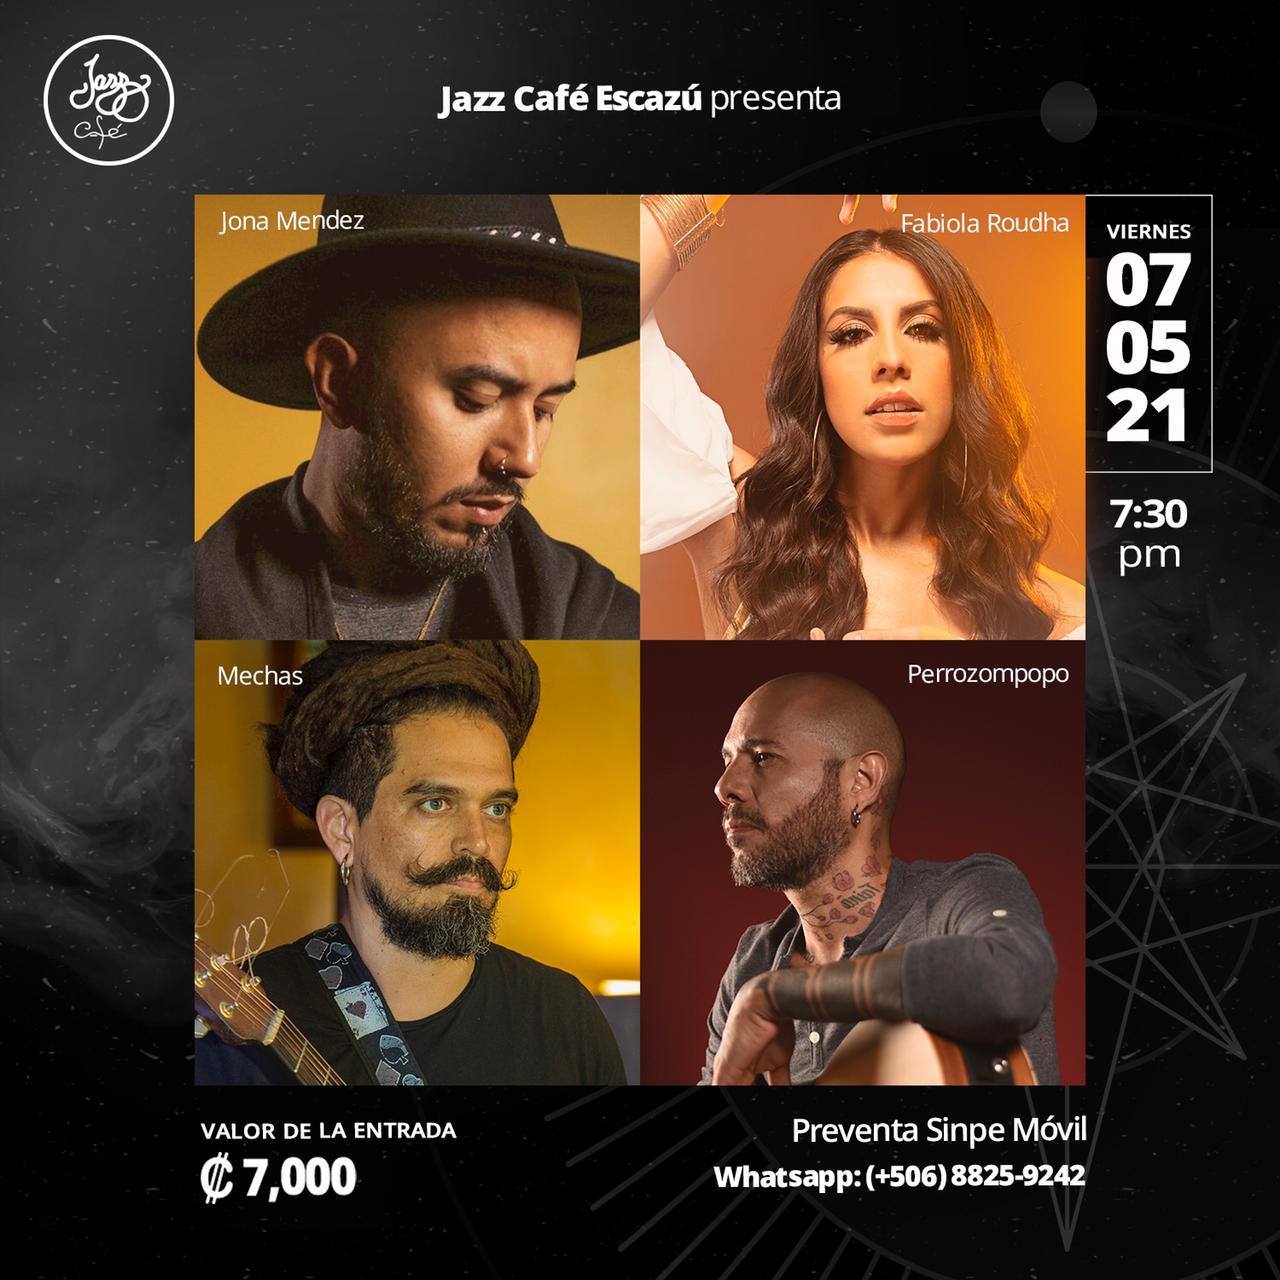 Jona Méndez+Fabiola Roundha+Perrozompopo+Mechas